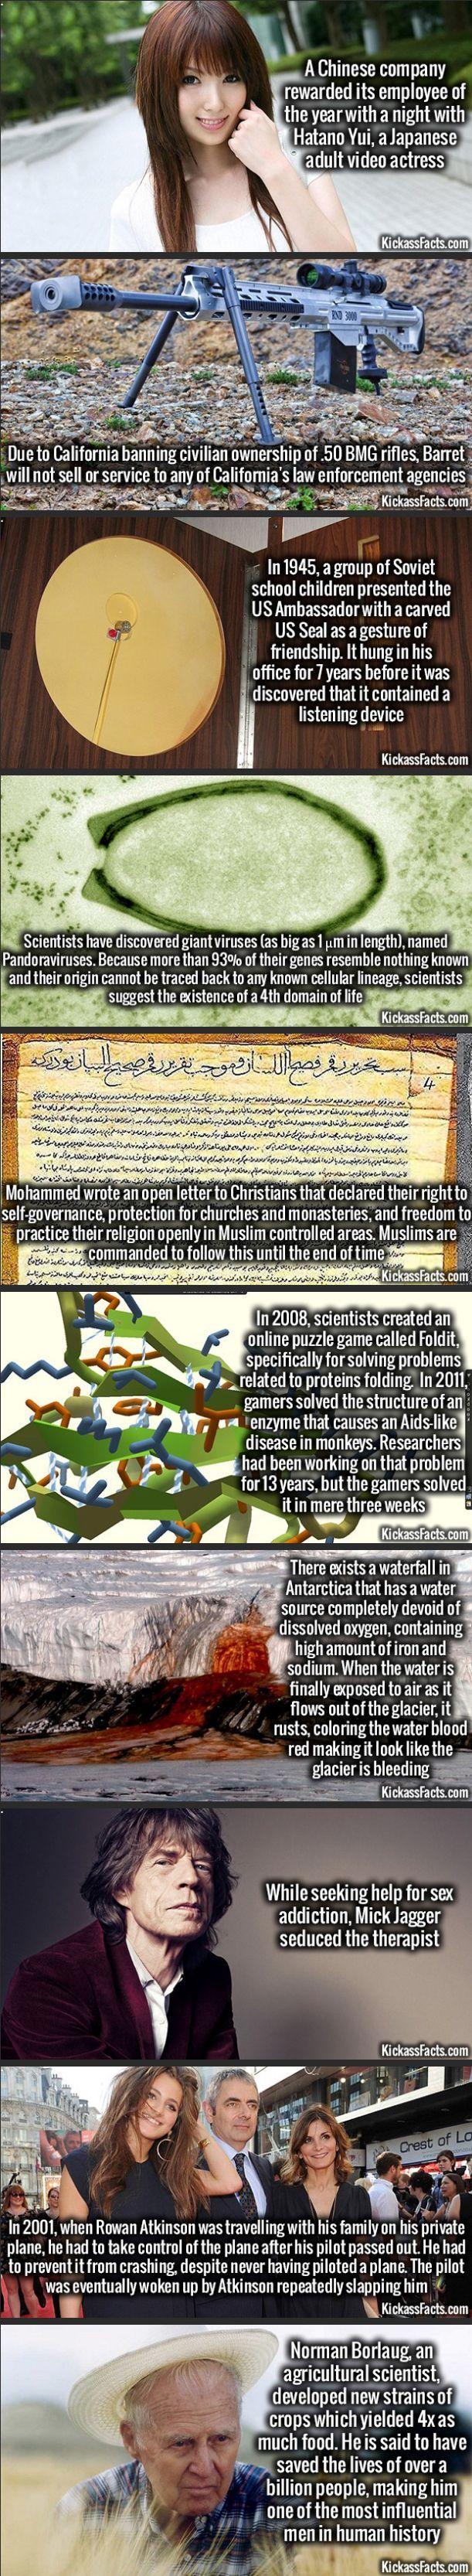 Some Random Interesting Facts Compilation